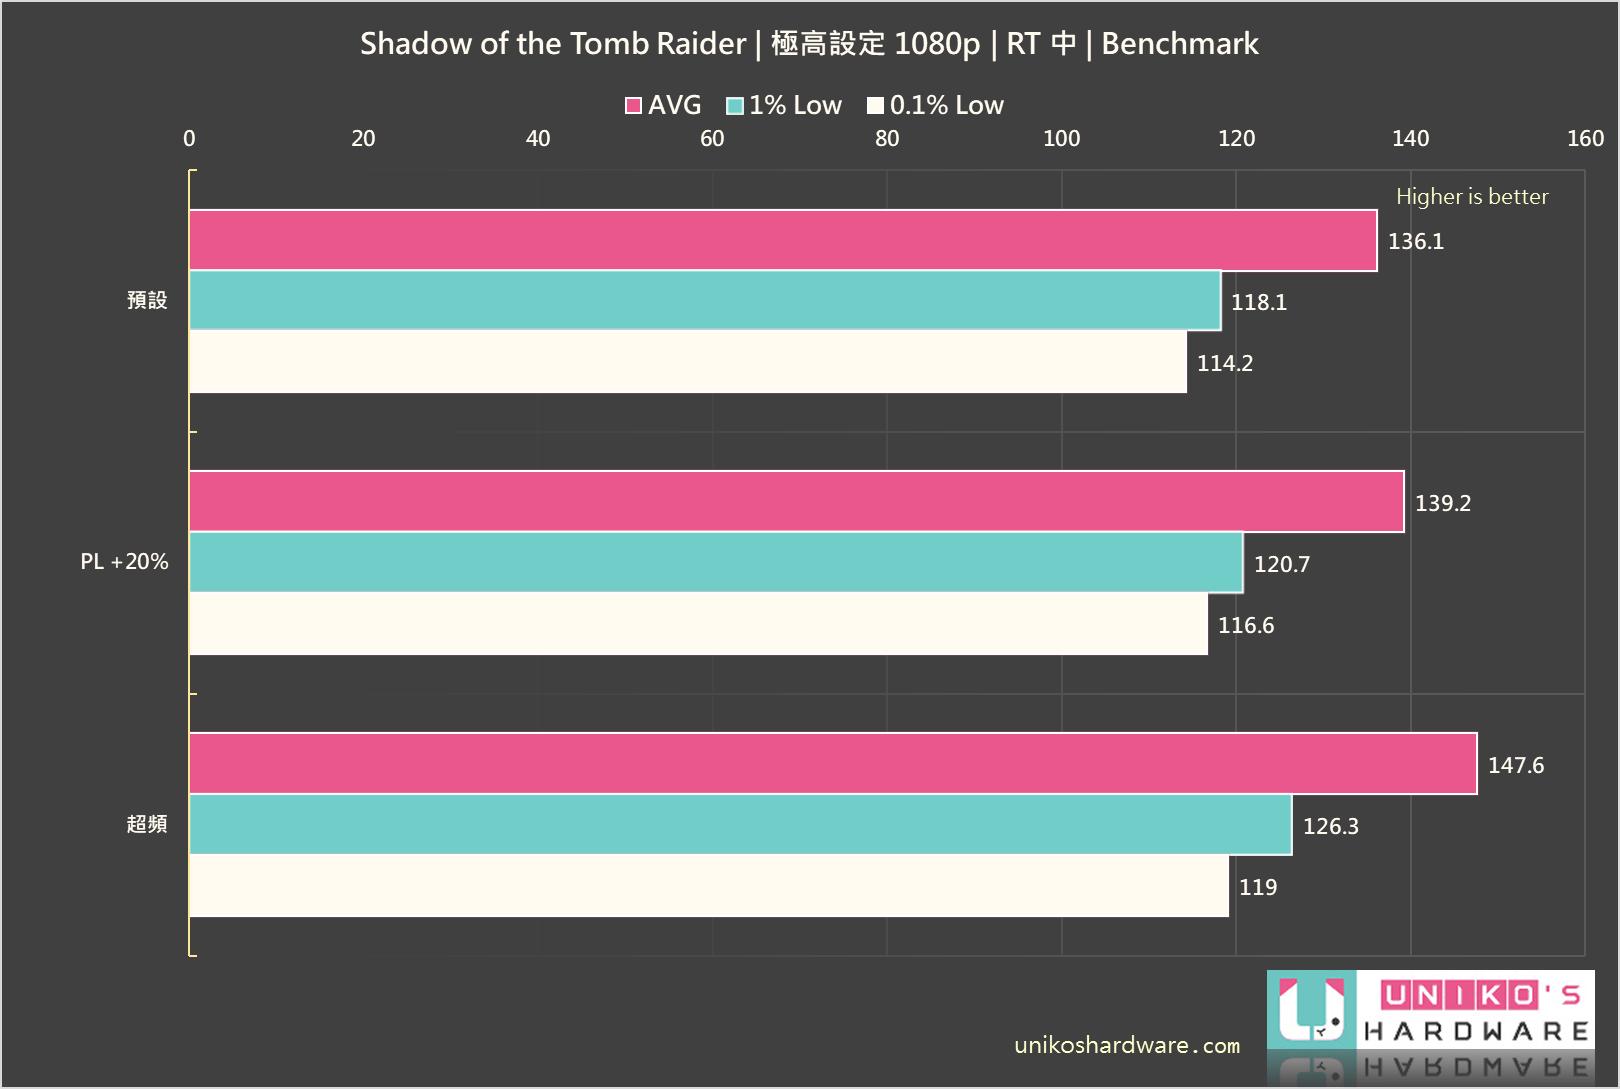 Shadow of the Tomb Raider (古墓奇兵:暗影)。